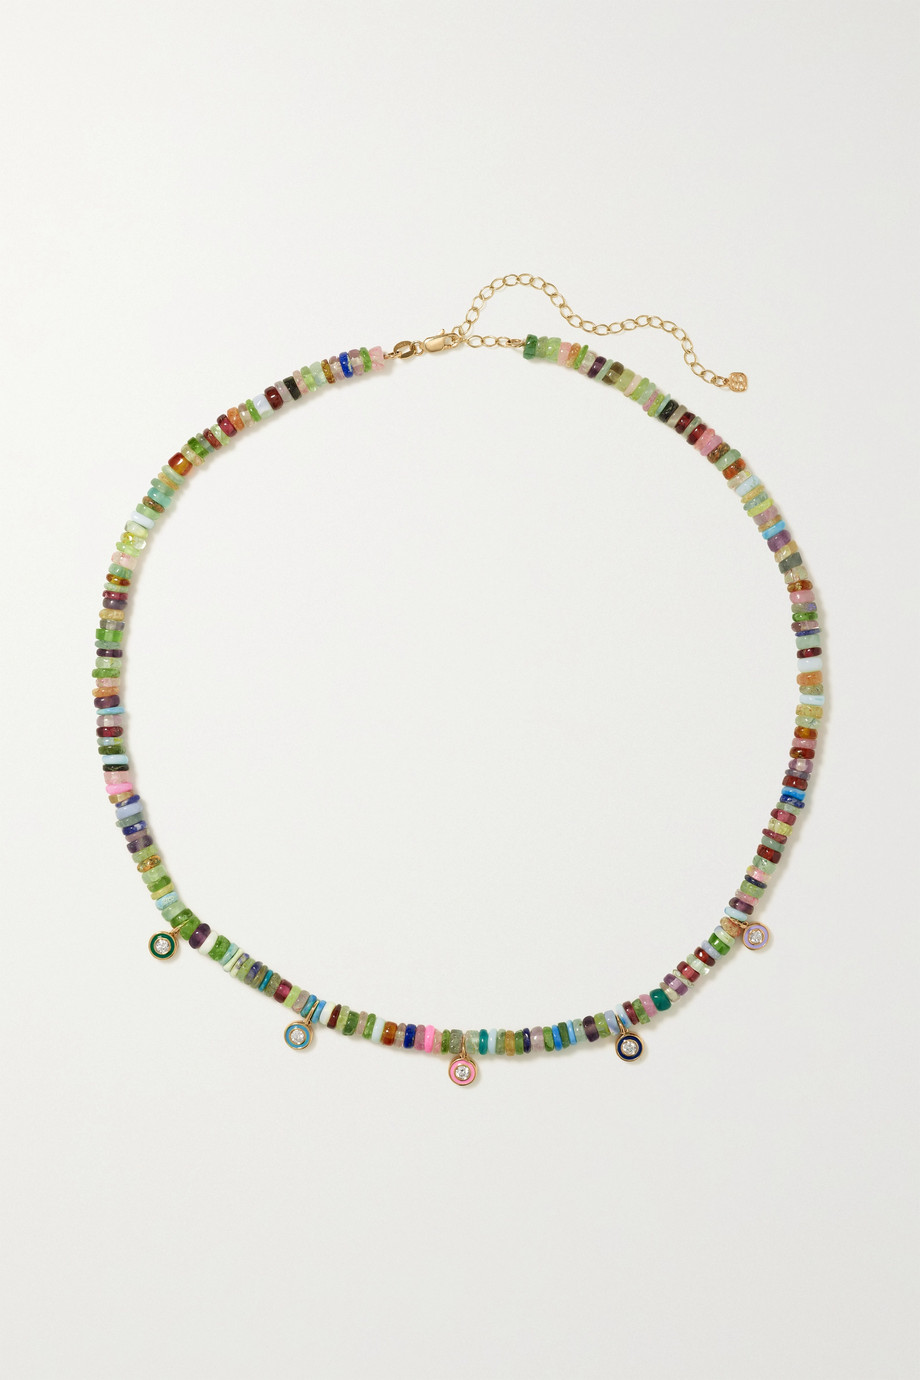 Sydney Evan 14-karat gold, multi-stone and enamel necklace